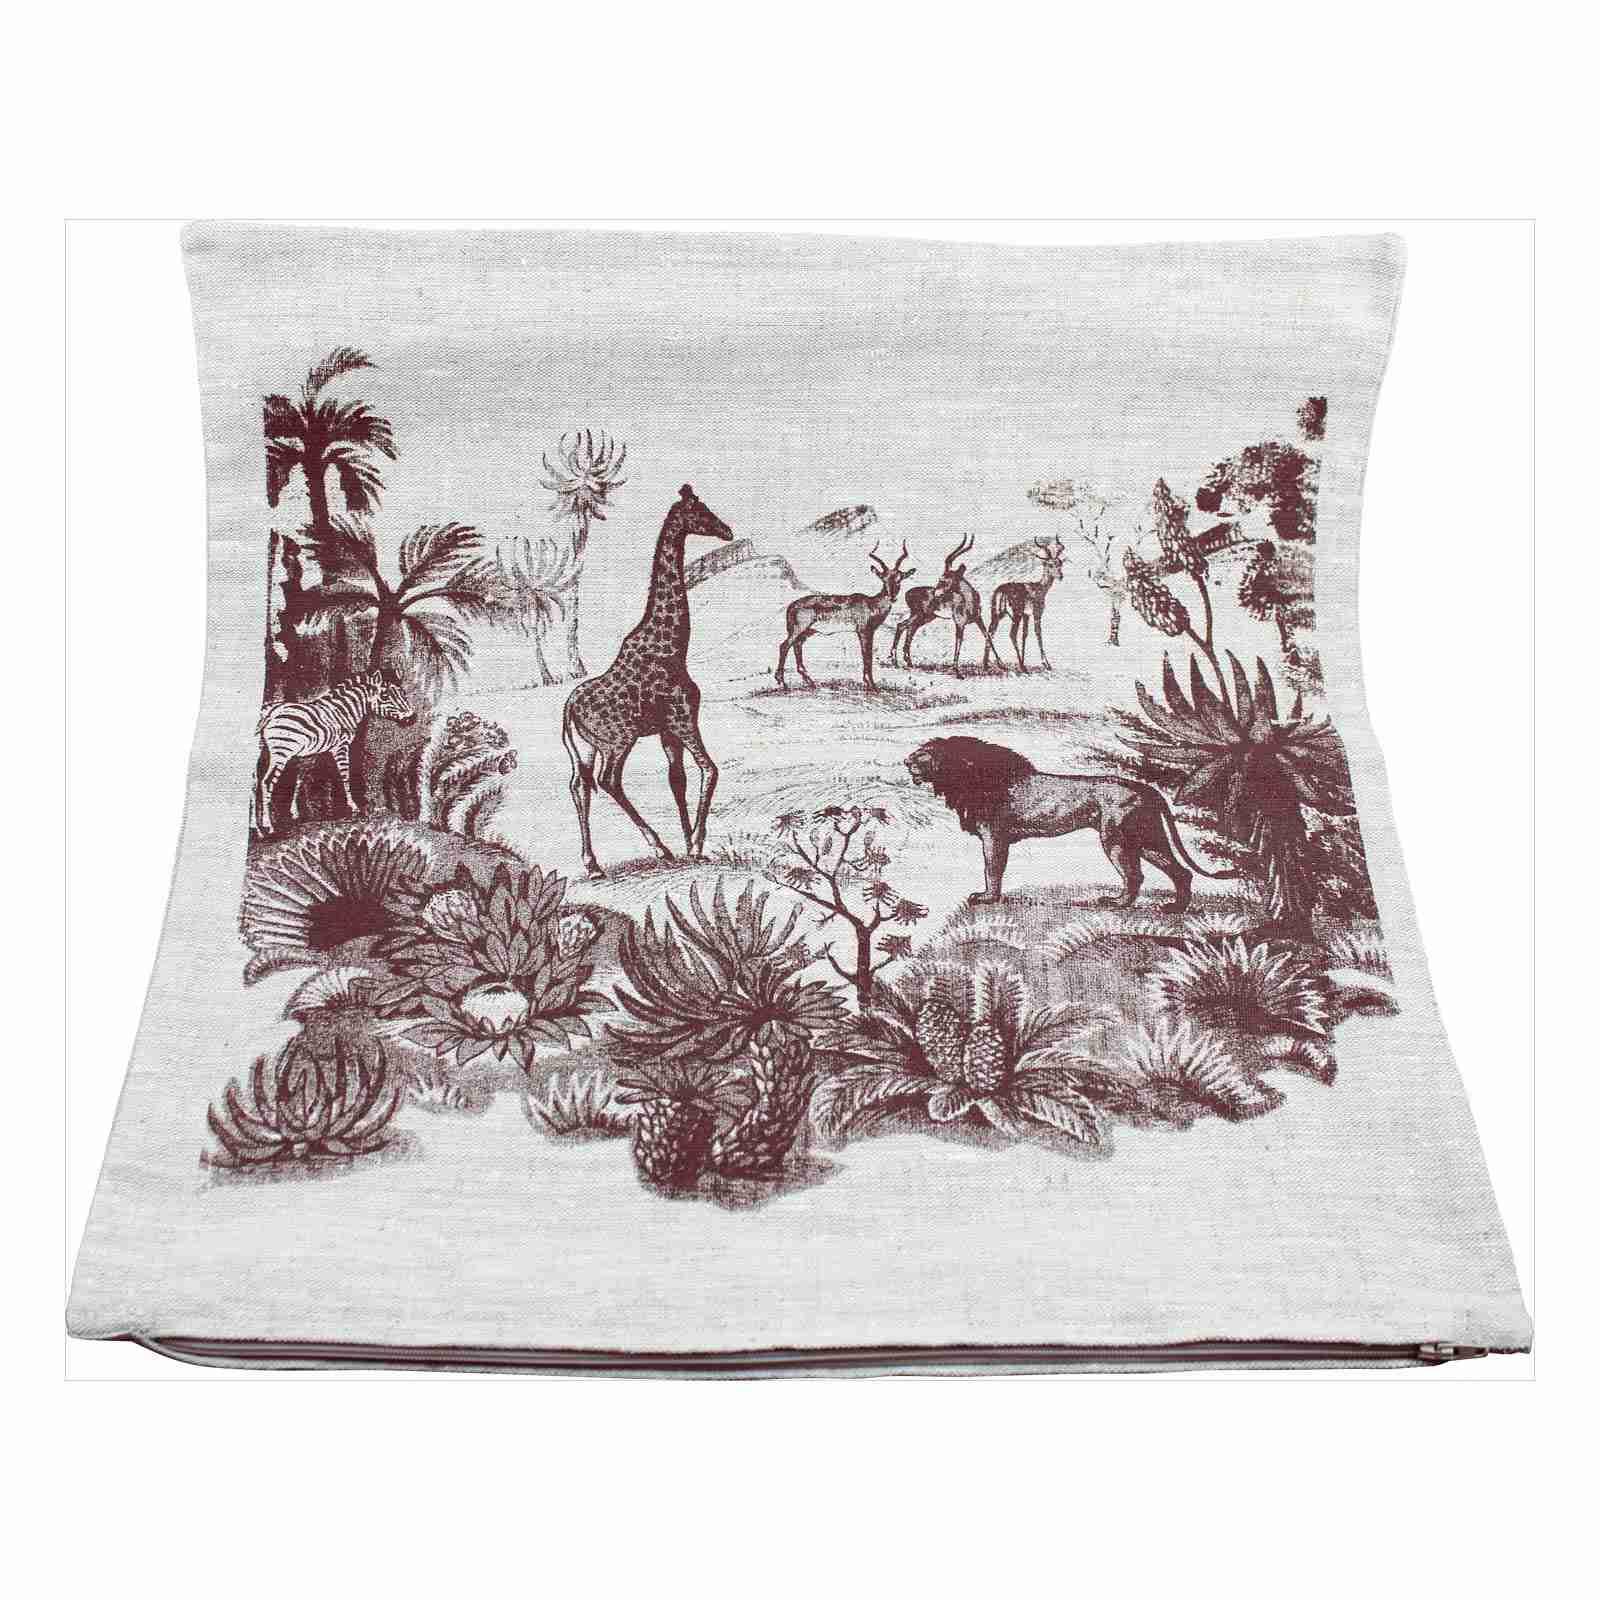 Hand Printed Linen Cushion 18in by 18in - Safari Tan